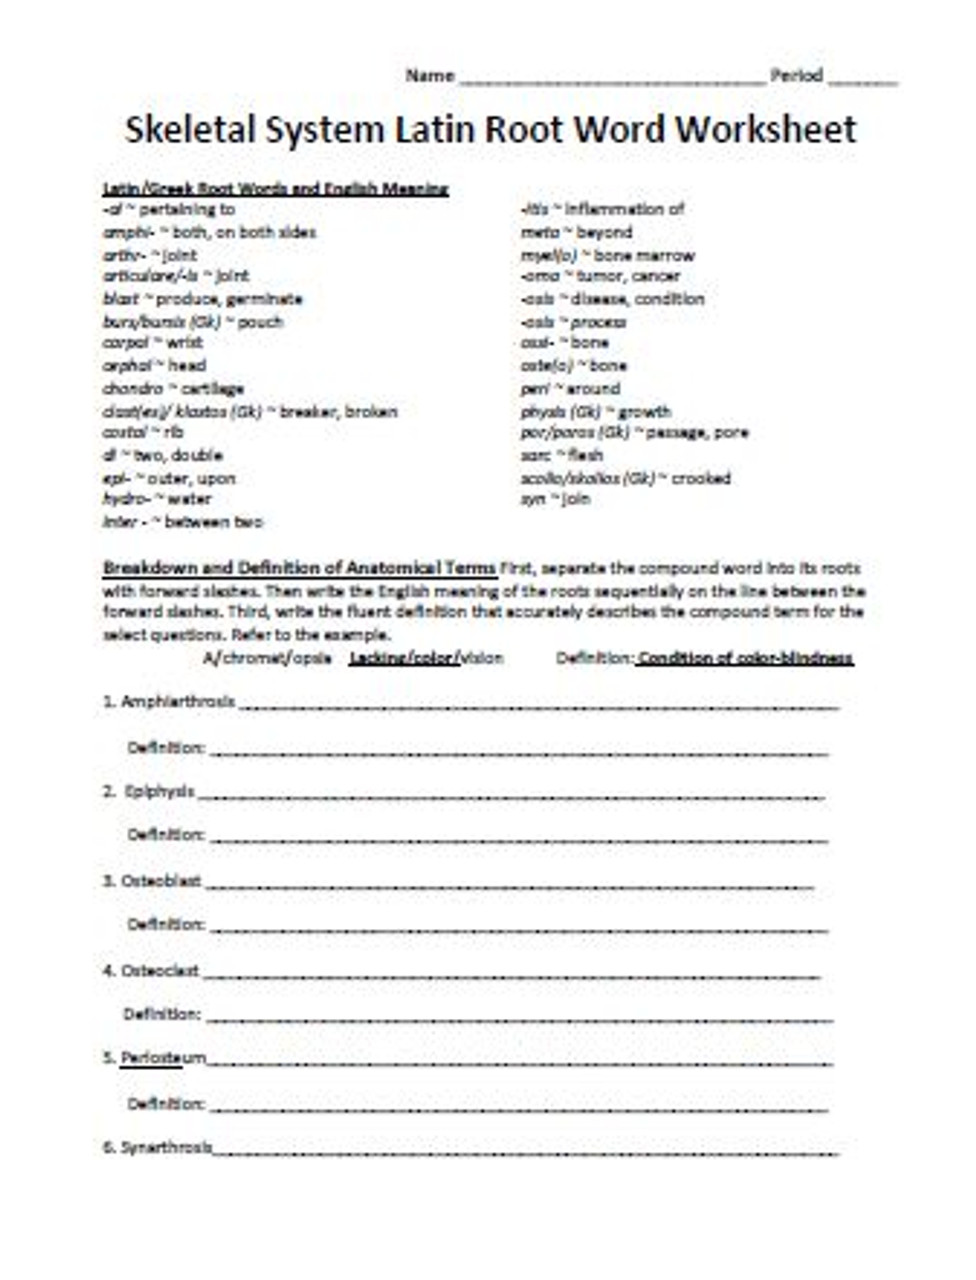 Skeletal System Latin Root Word Worksheet - Amped Up Learning [ 1280 x 976 Pixel ]